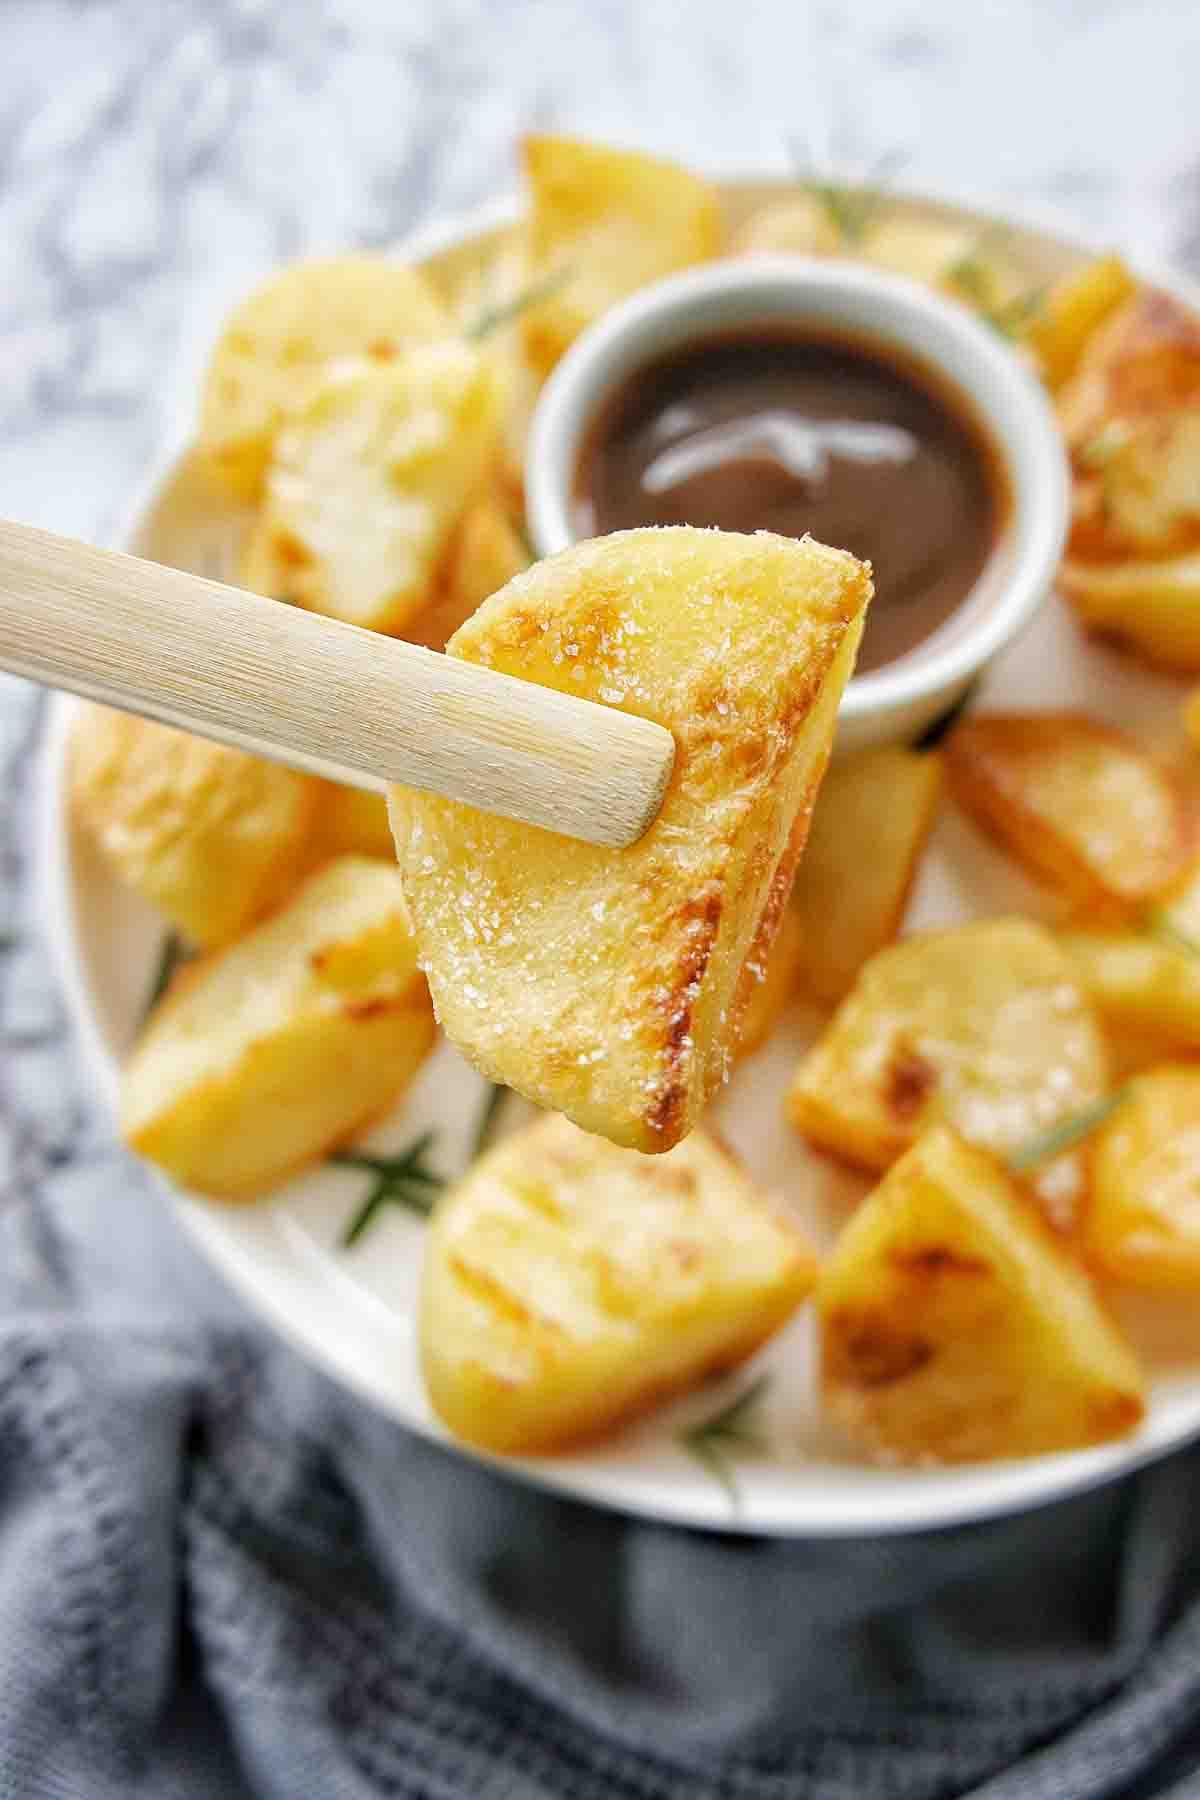 Tongs holding crispy roast potato above a white plate